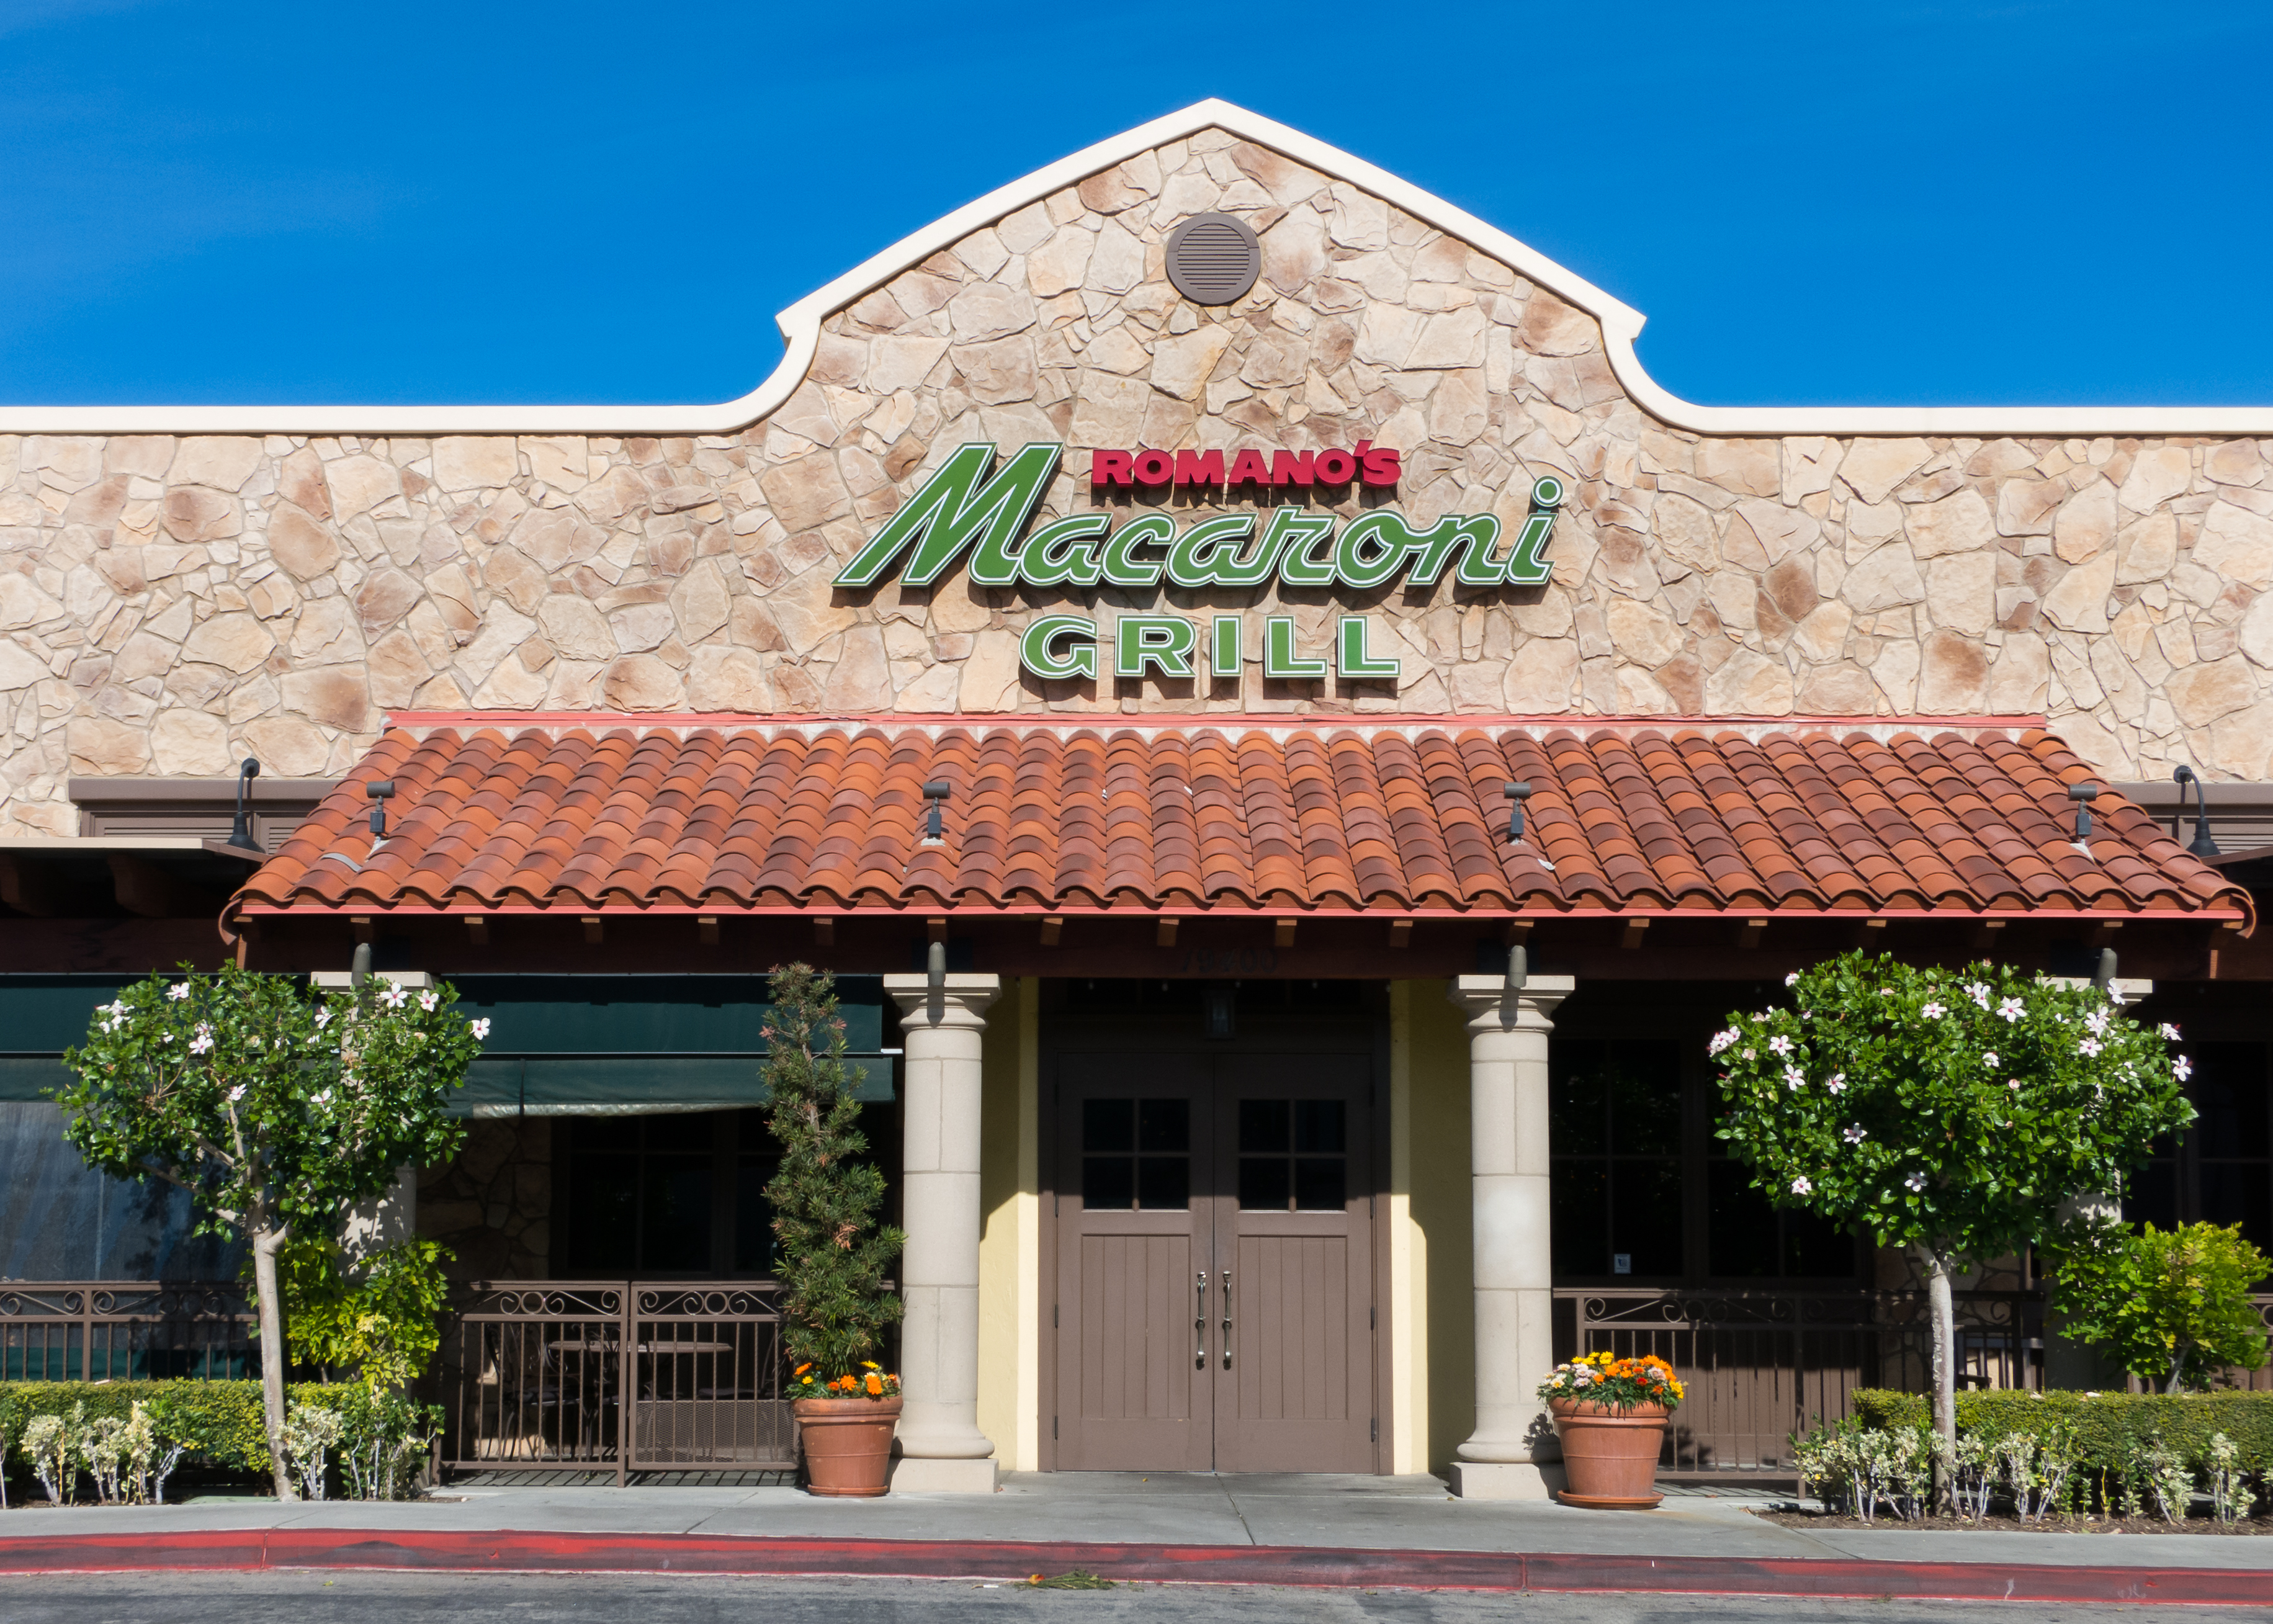 Romano's Macaroni Grill , Northridge, California, November 24, 2014.